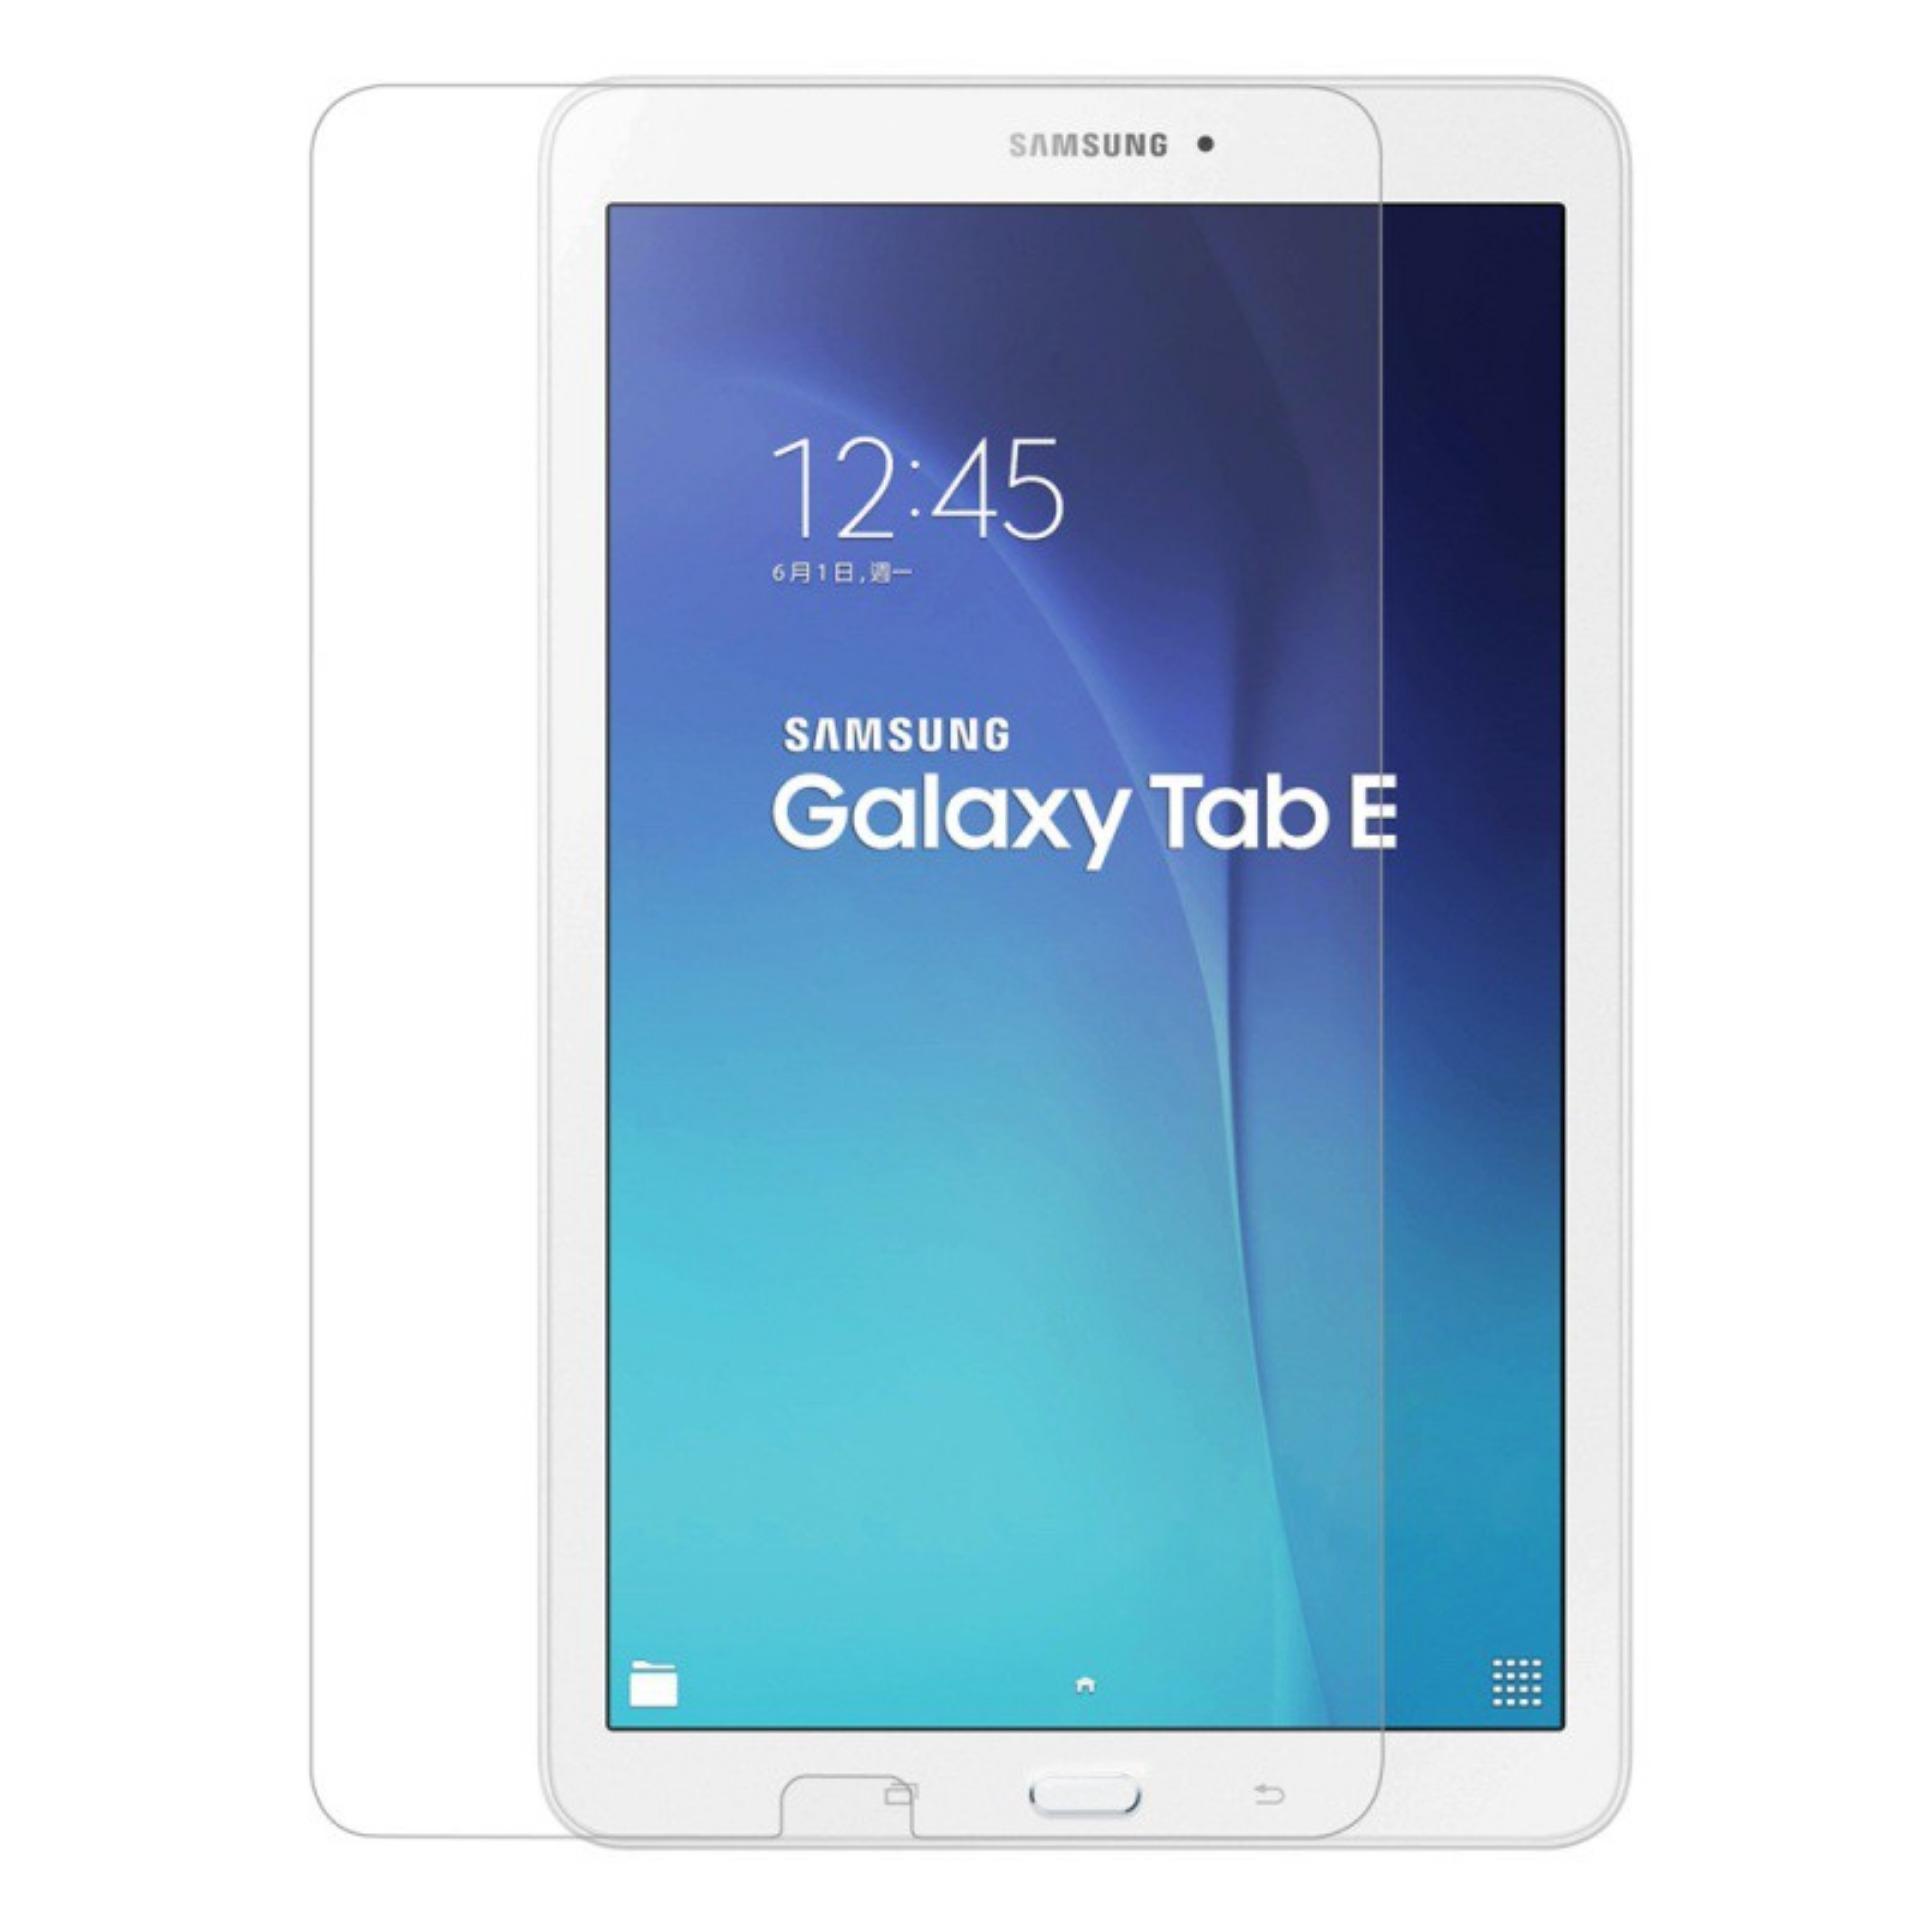 Vn Samsung Galaxy Tablet Tab E 9.6